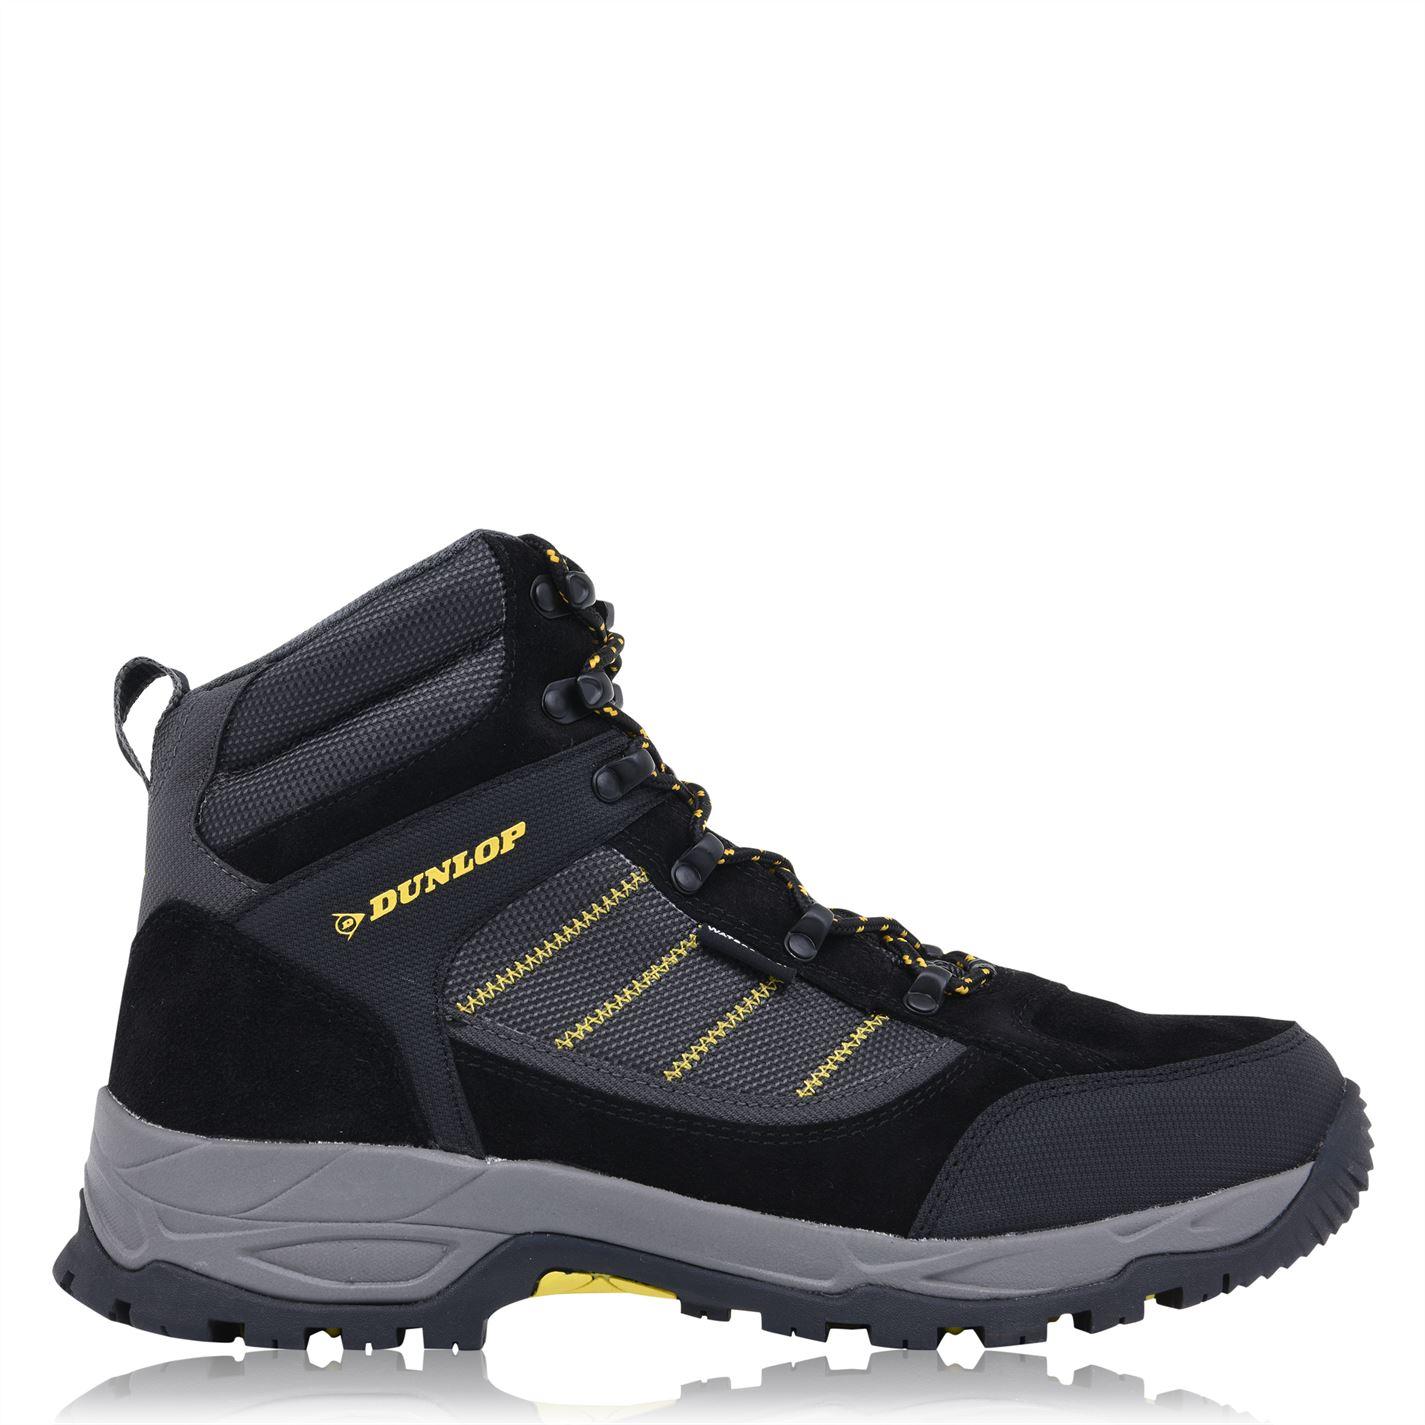 Dunlop Illinois Mens Steel Toe Cap Safety Boots Black